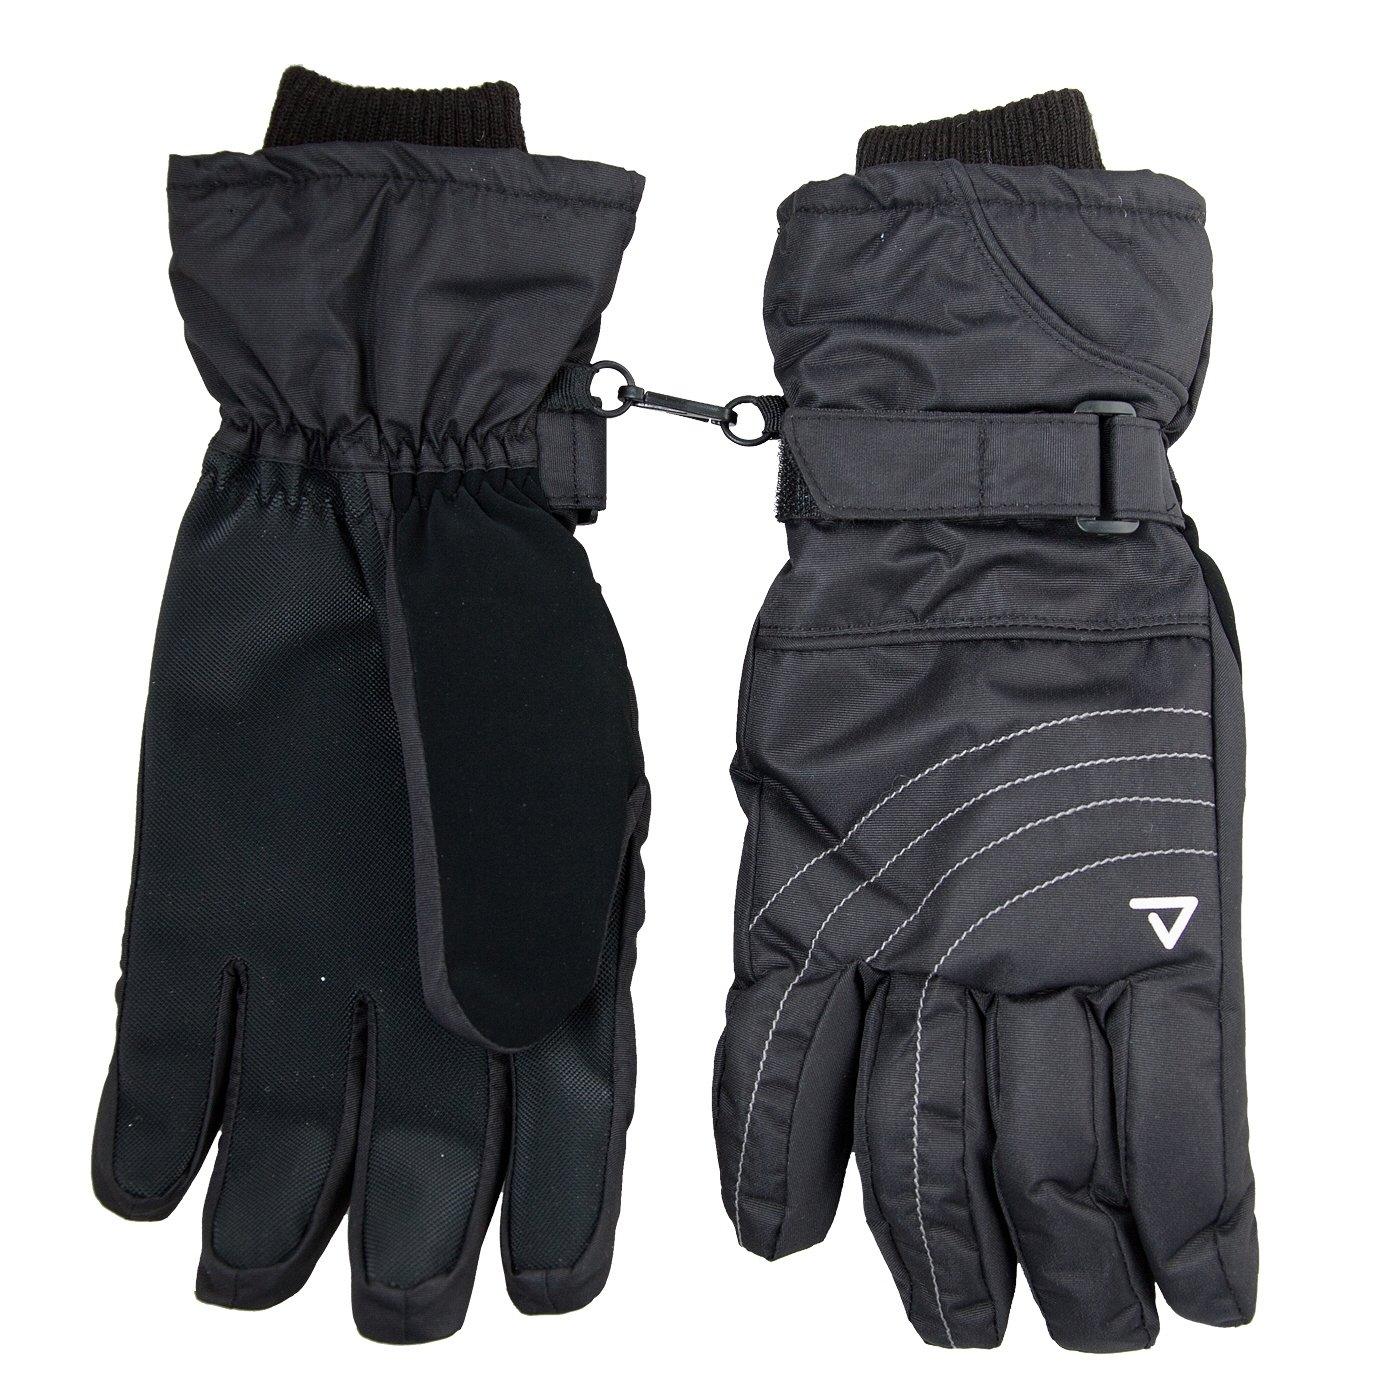 Dare 2b Damen Ski Handschuh